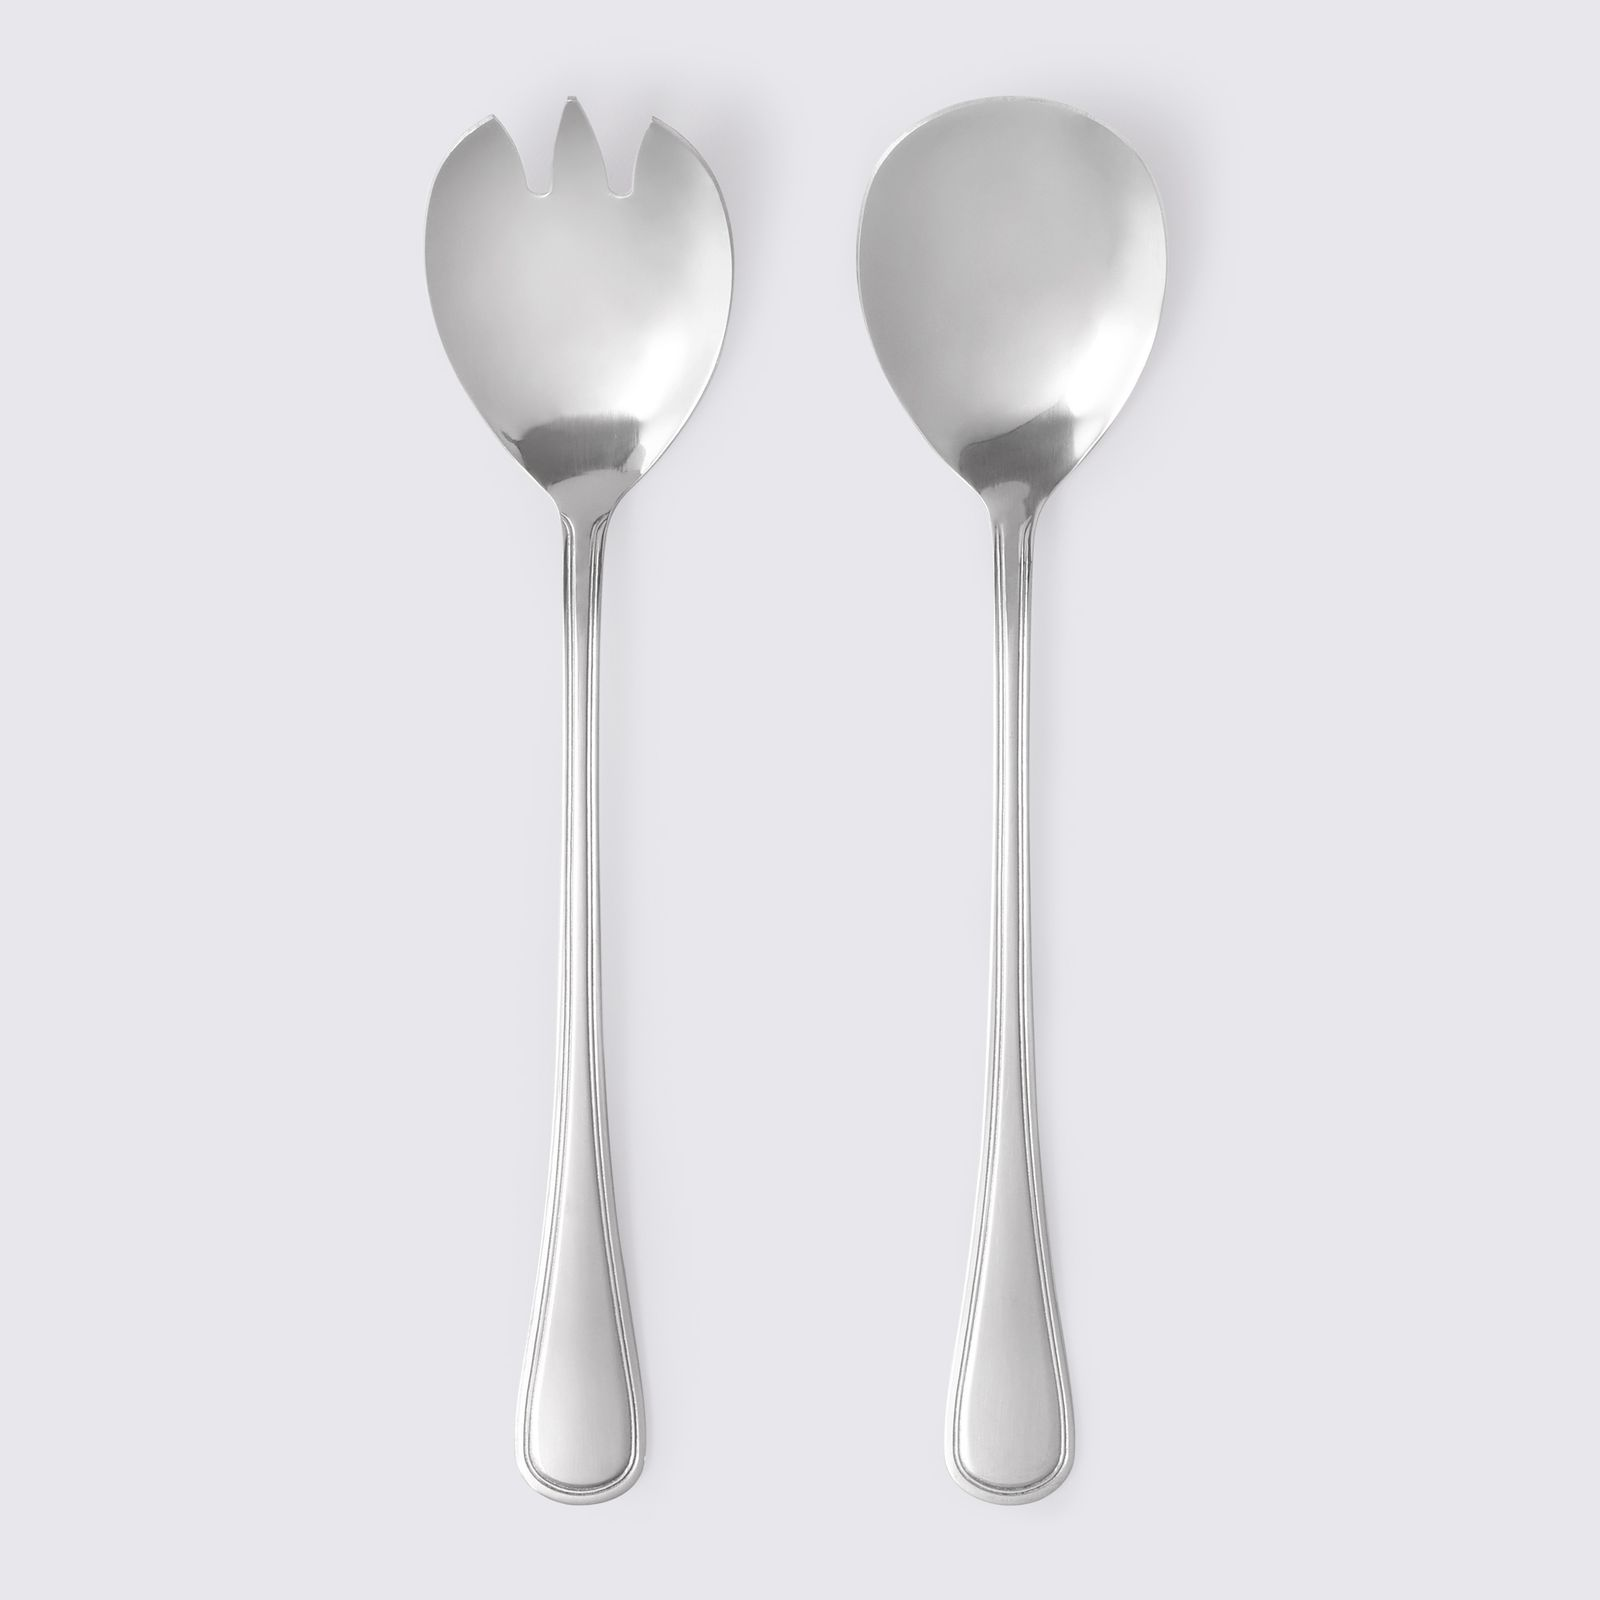 Lettuce spoons London 23,8 cm DOMOTTI